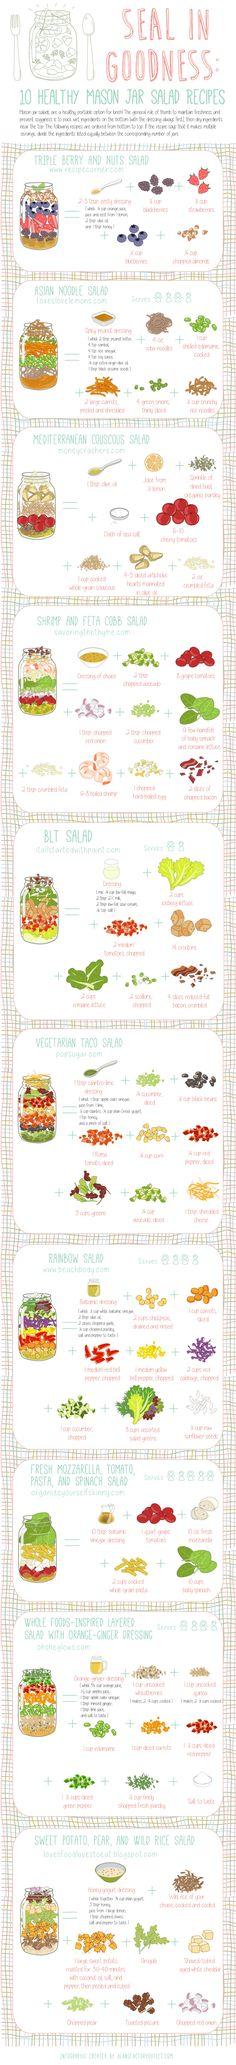 10 healthy mason jar salad recipes!